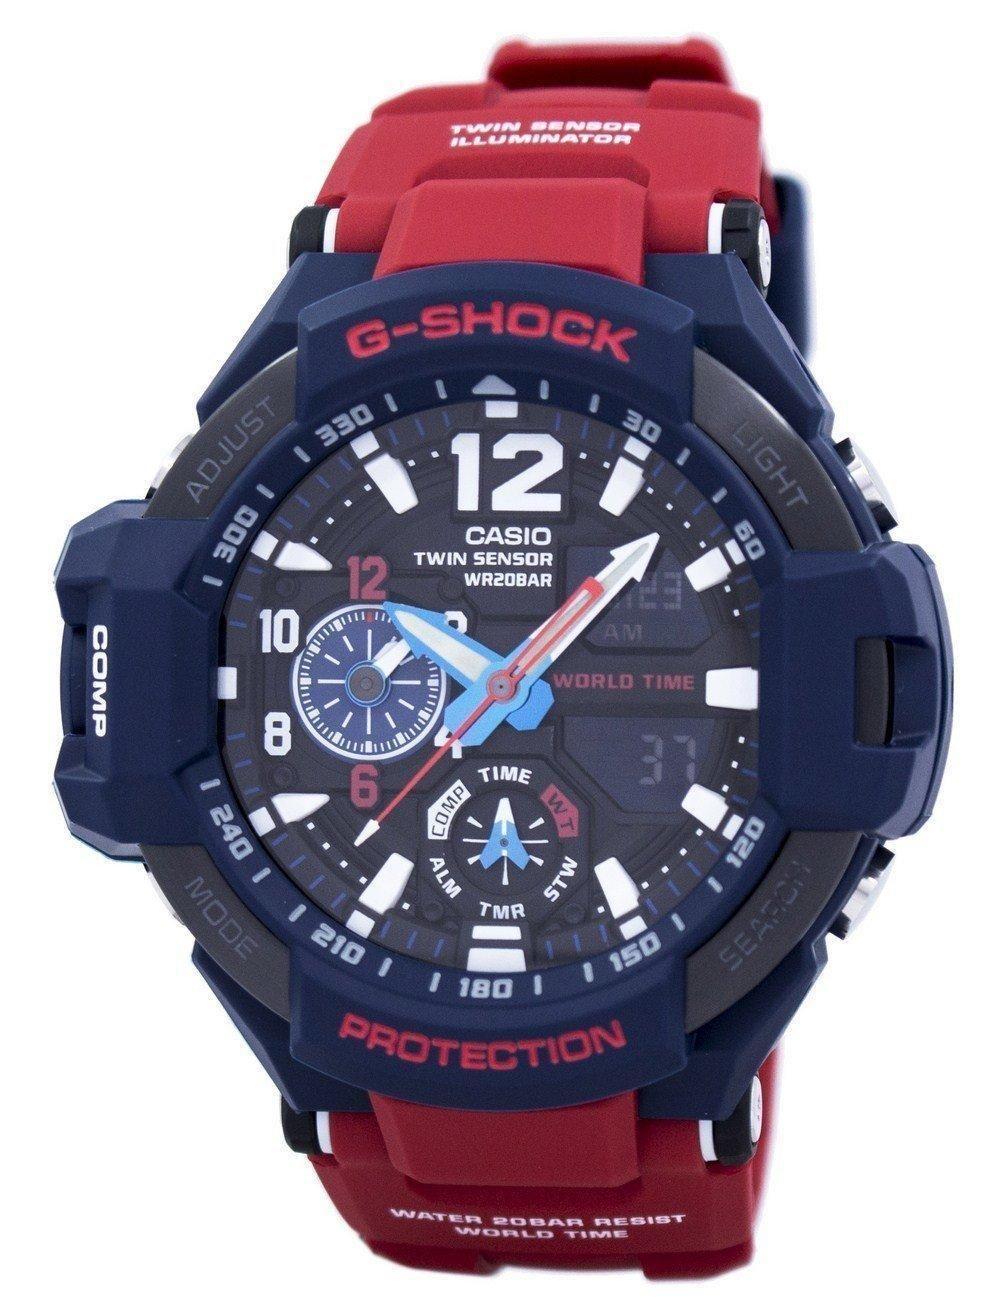 482da82c7b34 Casio G-shock Gravitymaster Shock Resistant World Time Ga-1100-2a Men s  Watch (FREE Shipping)